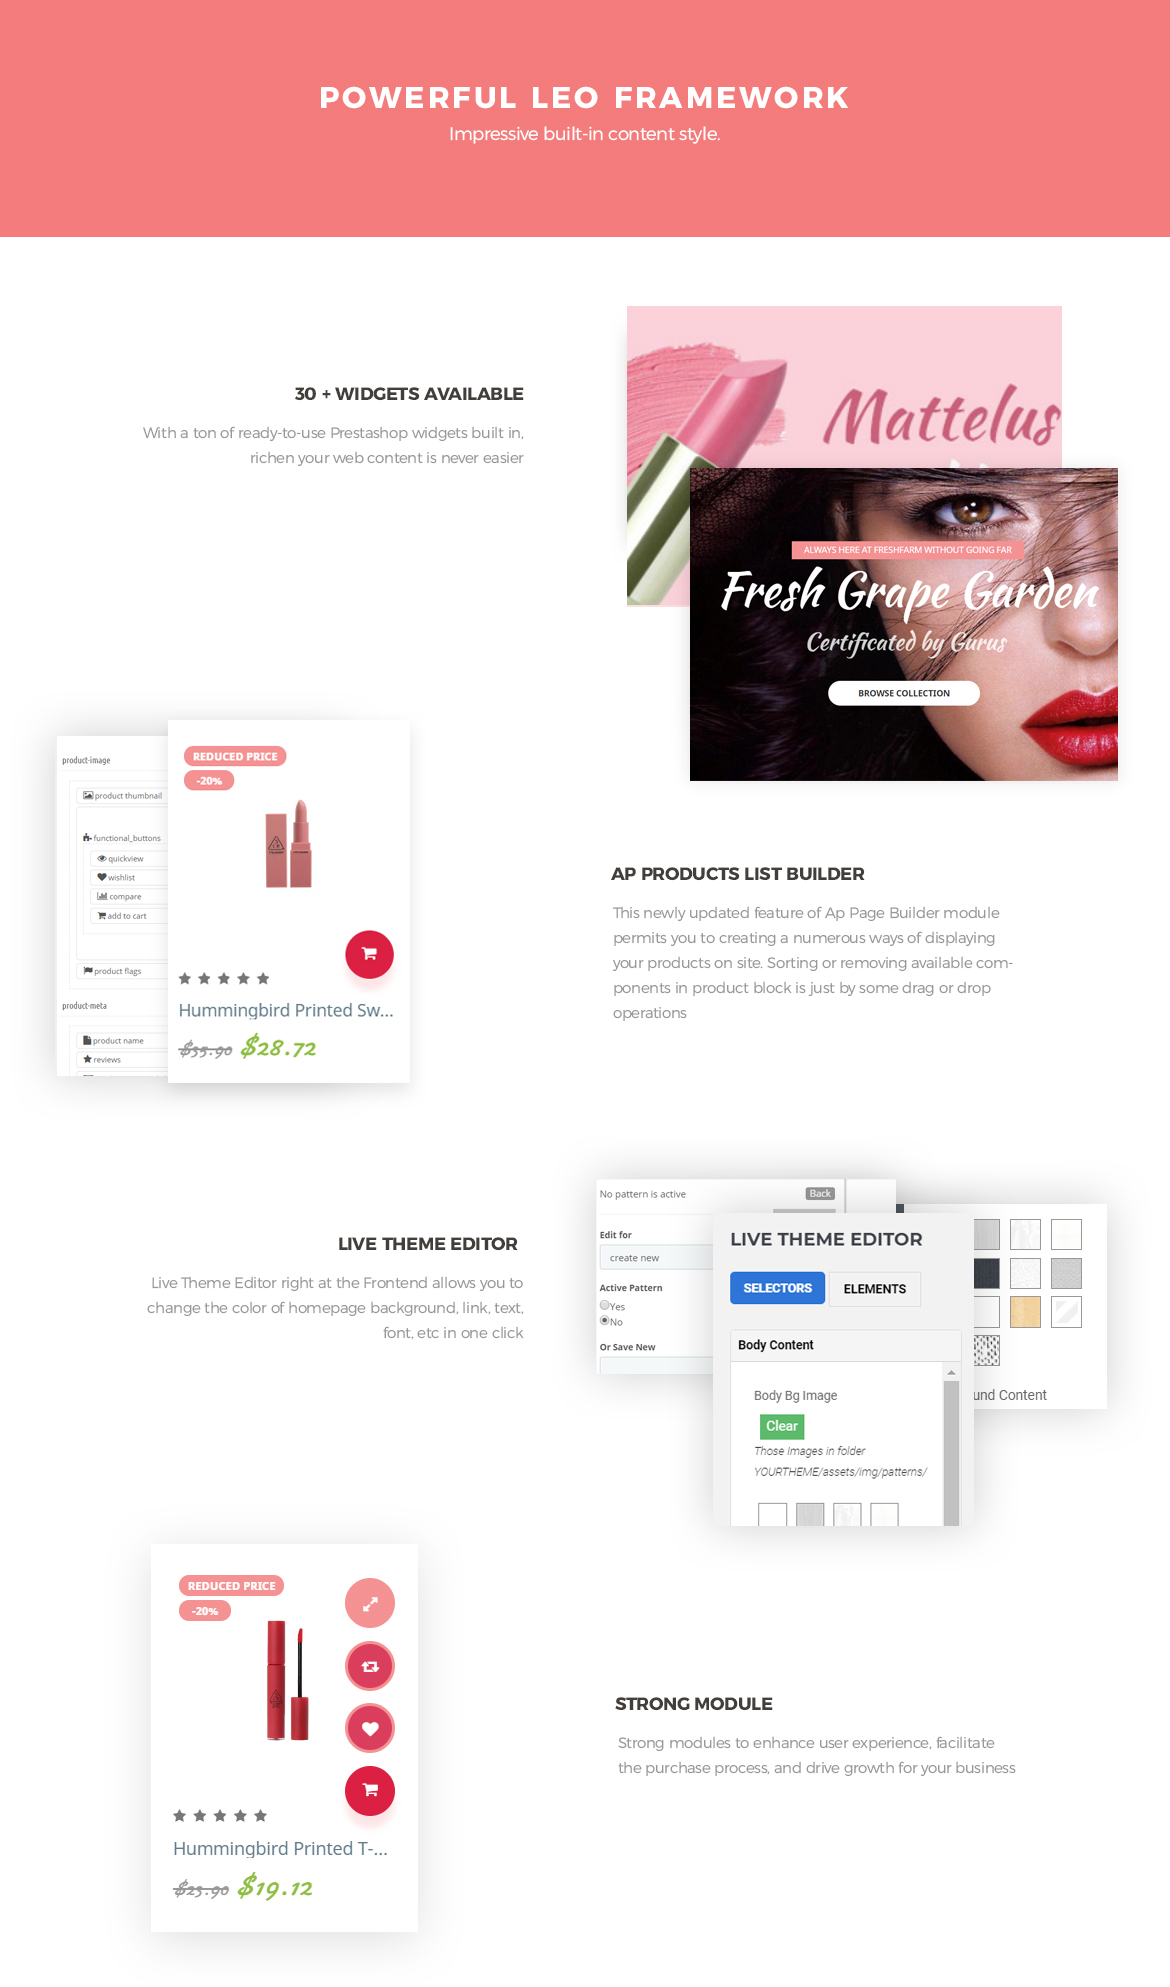 powerful prestashop framework - Leo Lipart - Cosmetics and Beauty Prestashop Theme